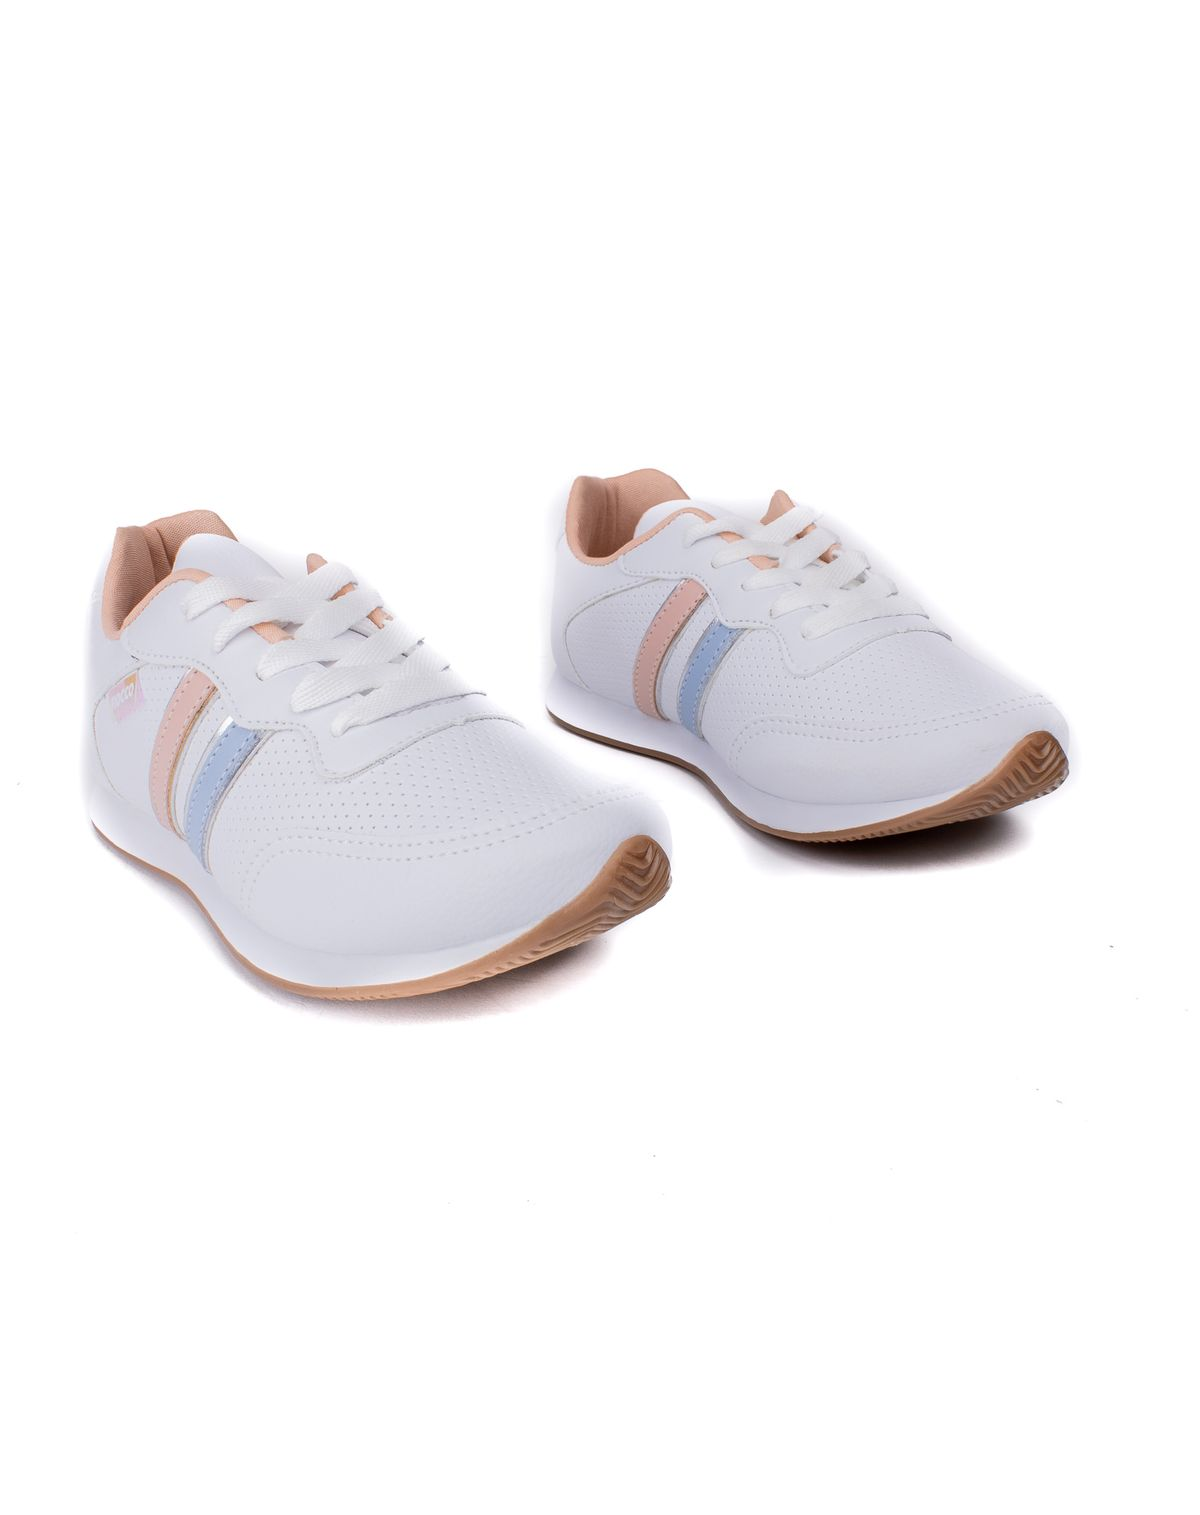 566095009-tenis-casual-infantil-menina-recortes-fiocco-branco-28-af5